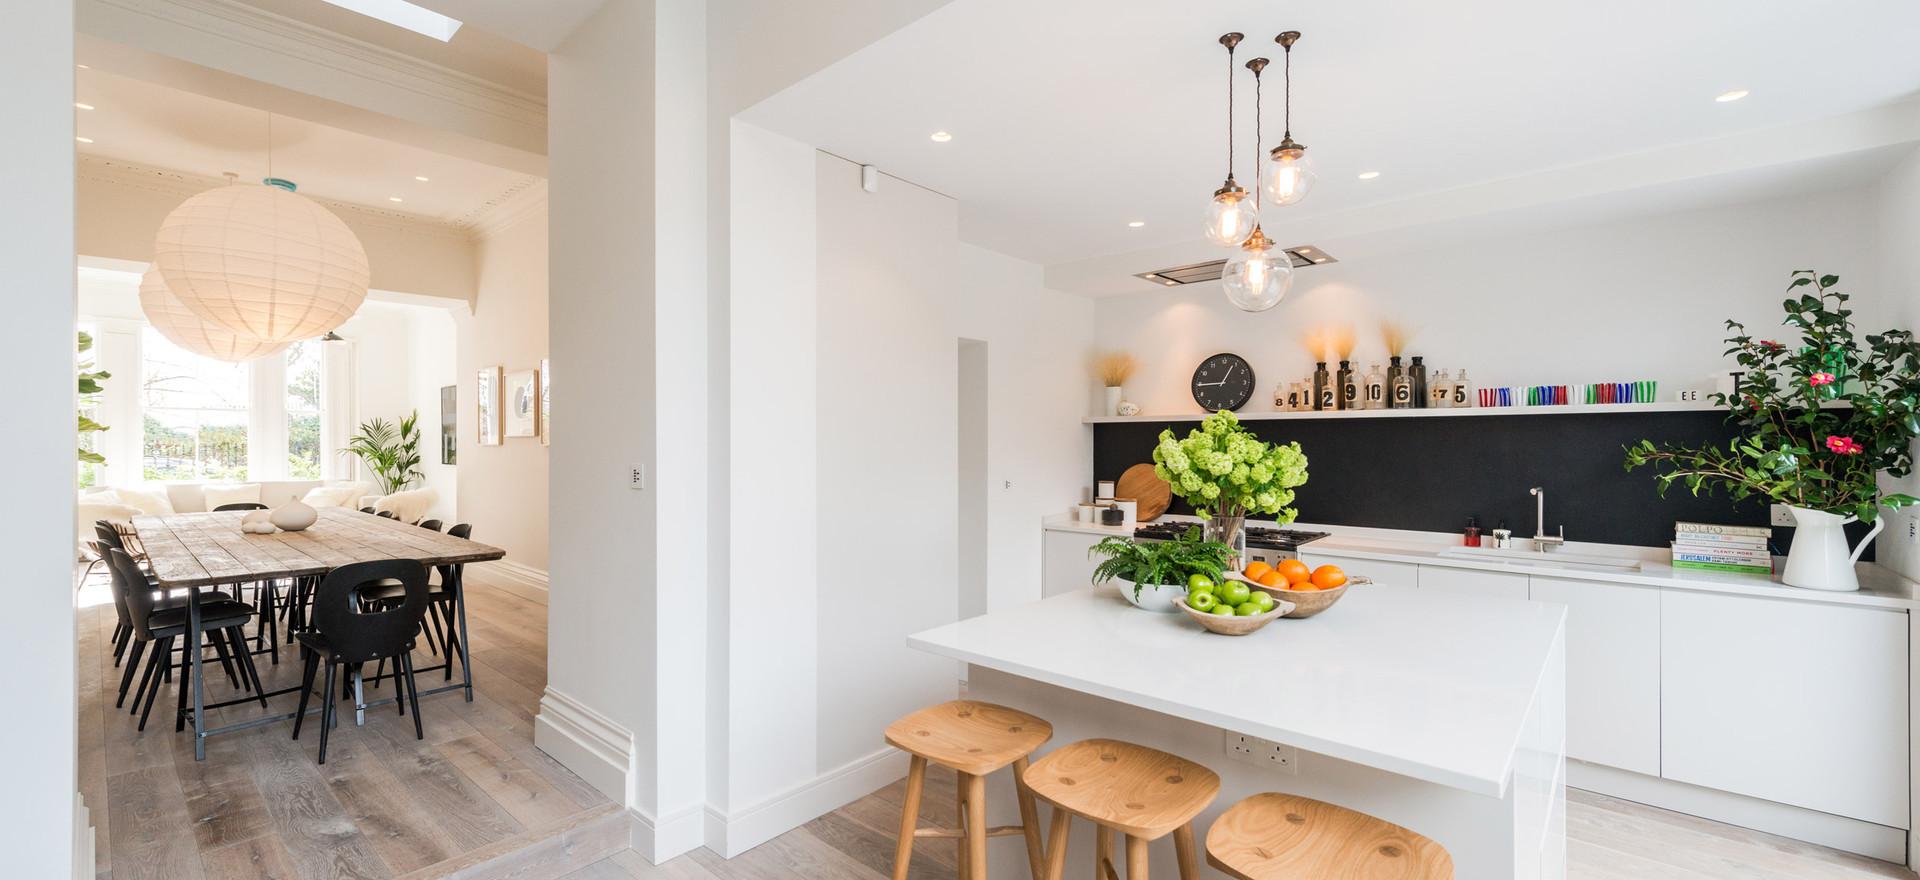 StG-kitchen-dining.jpg